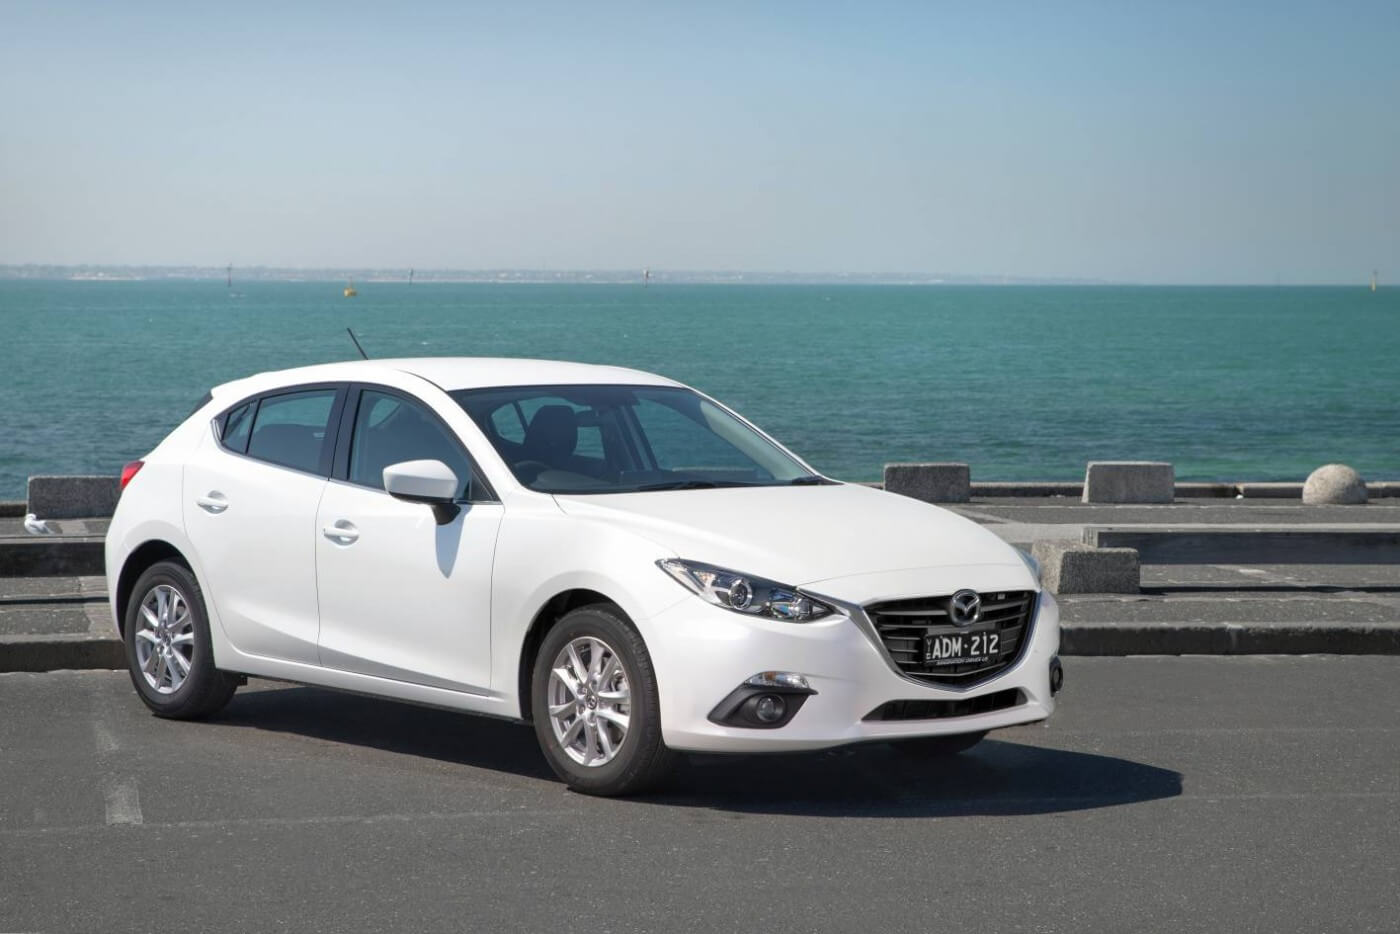 Kelebihan Kekurangan Mazda 3 Hatchback 2015 Harga